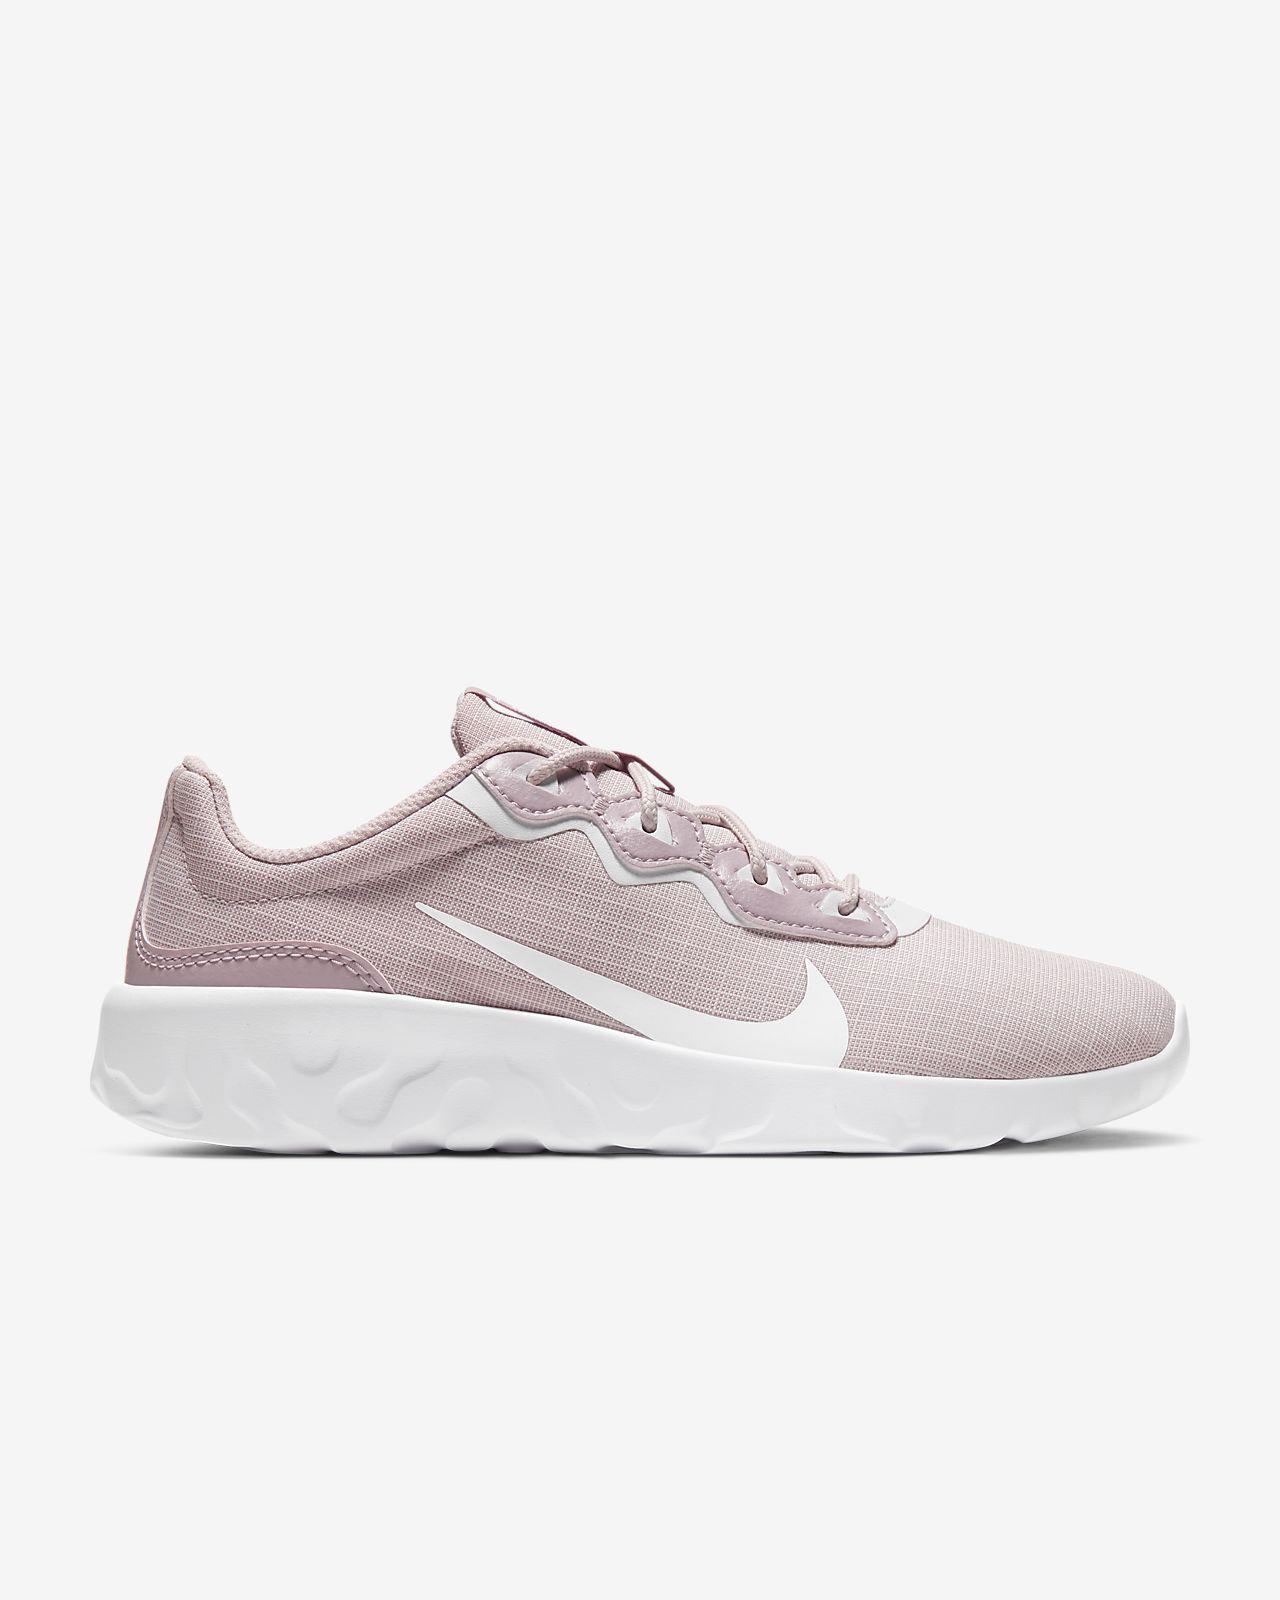 Nike Explore Strada 女子运动鞋